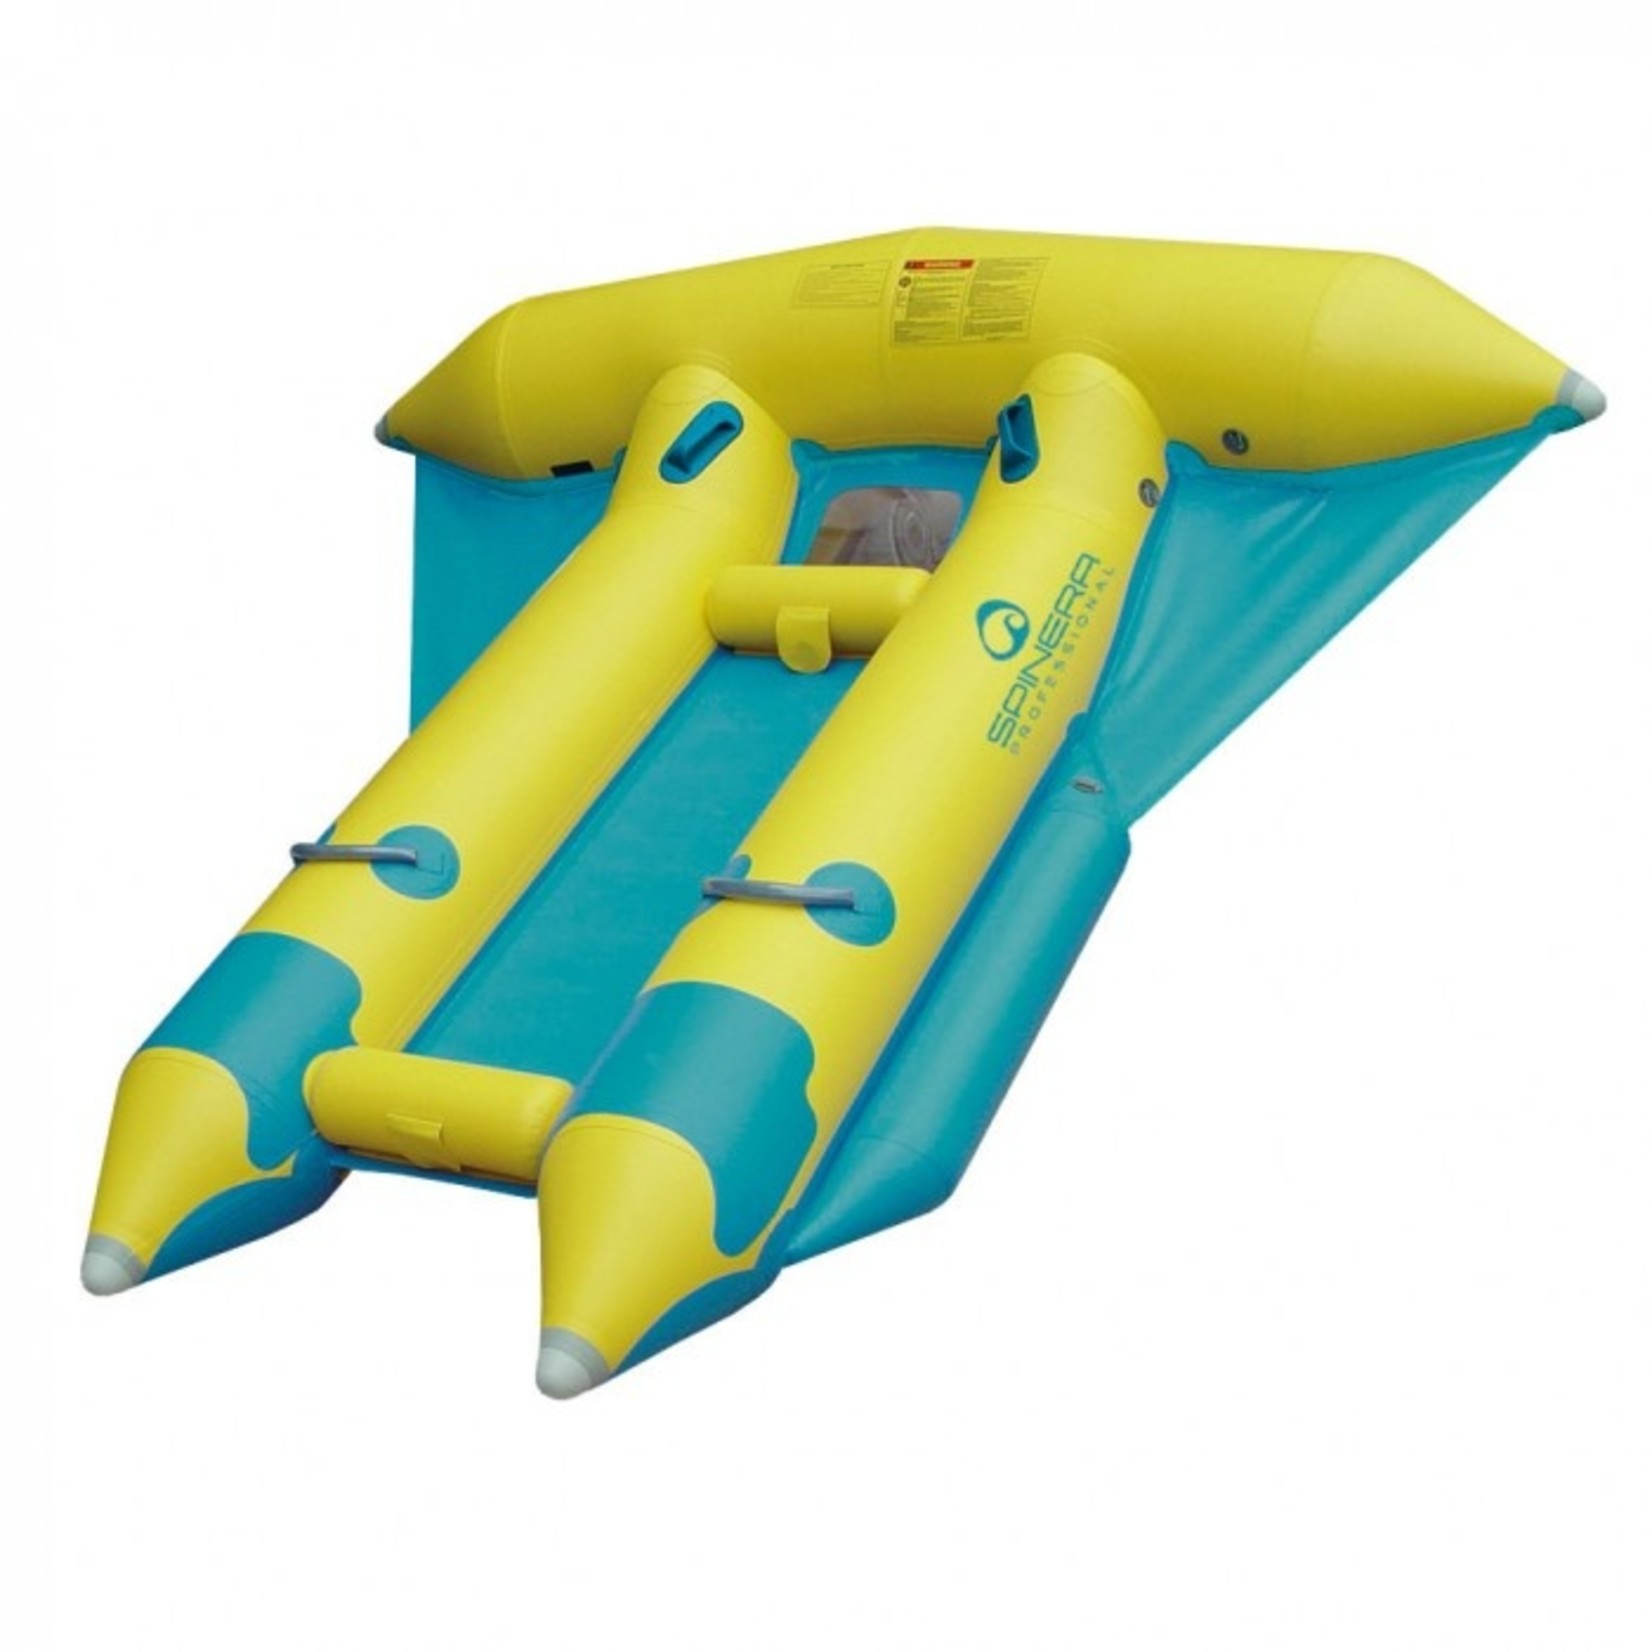 Spinera Professional Water Glider 3 - Flying banana